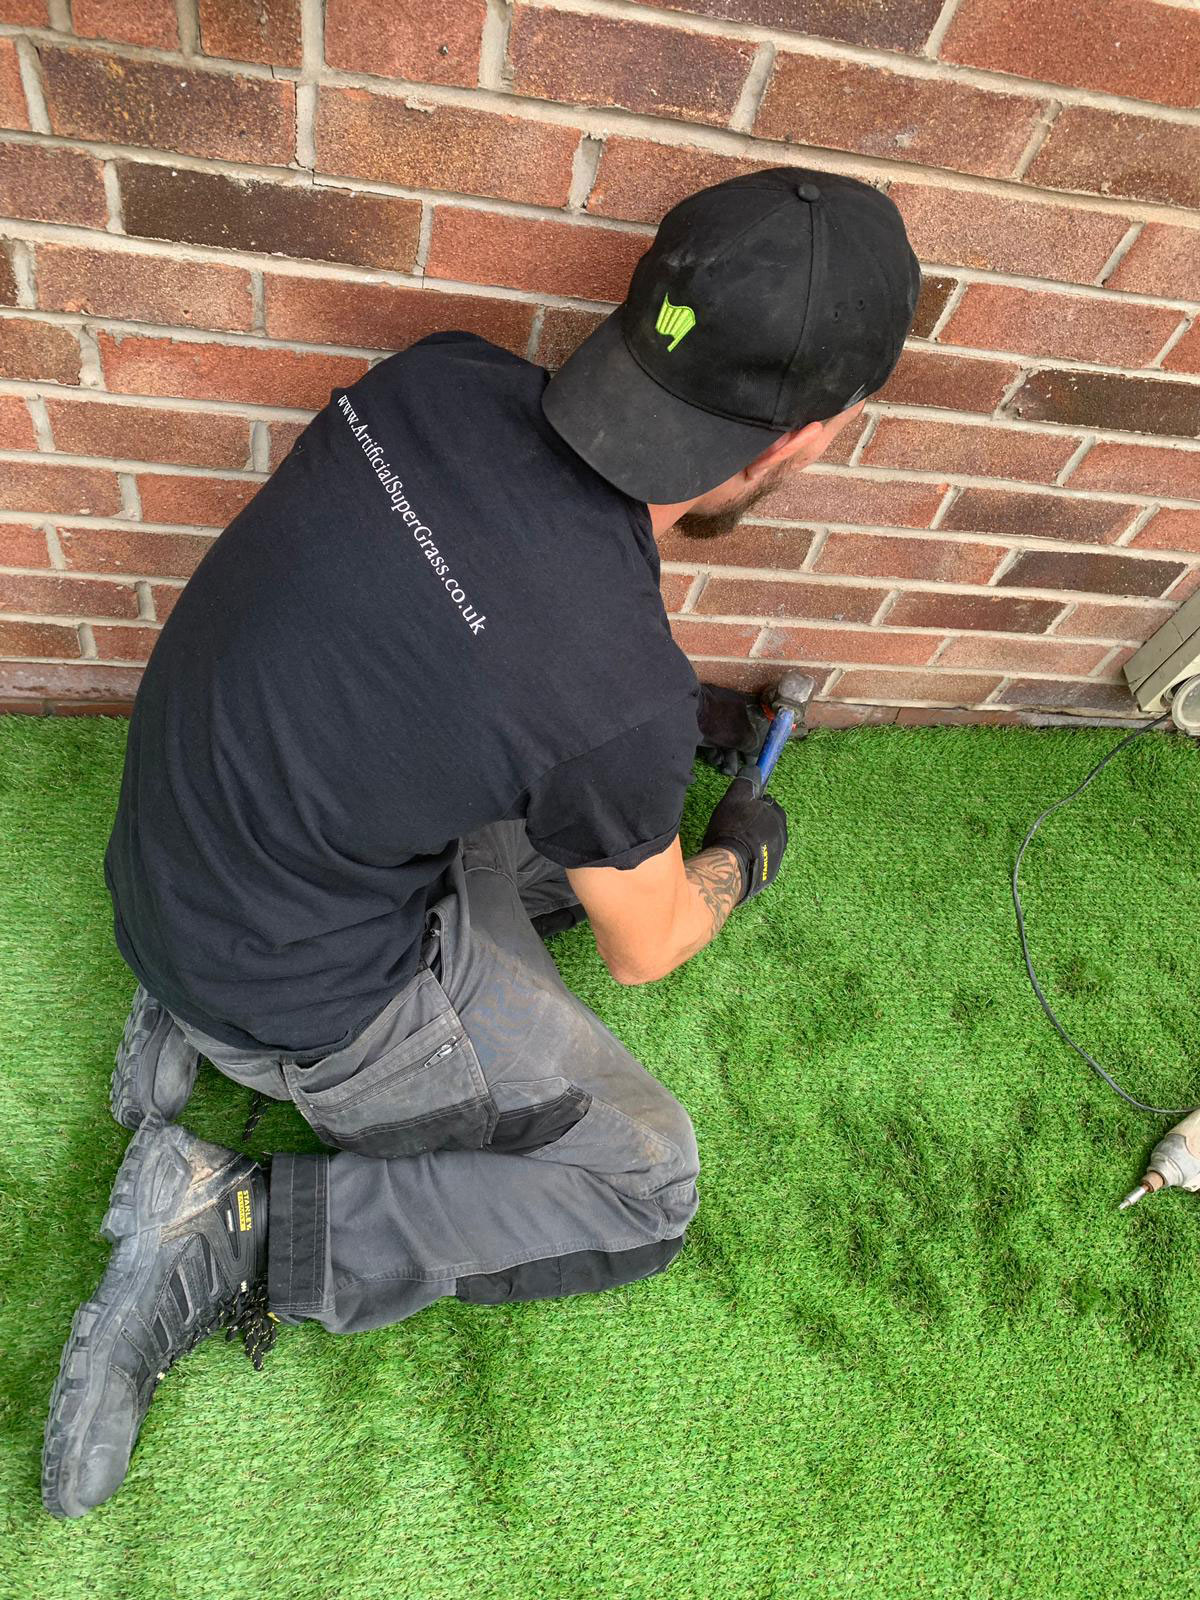 Astro Turf Redcar and Cleveland Artificial Super Grass